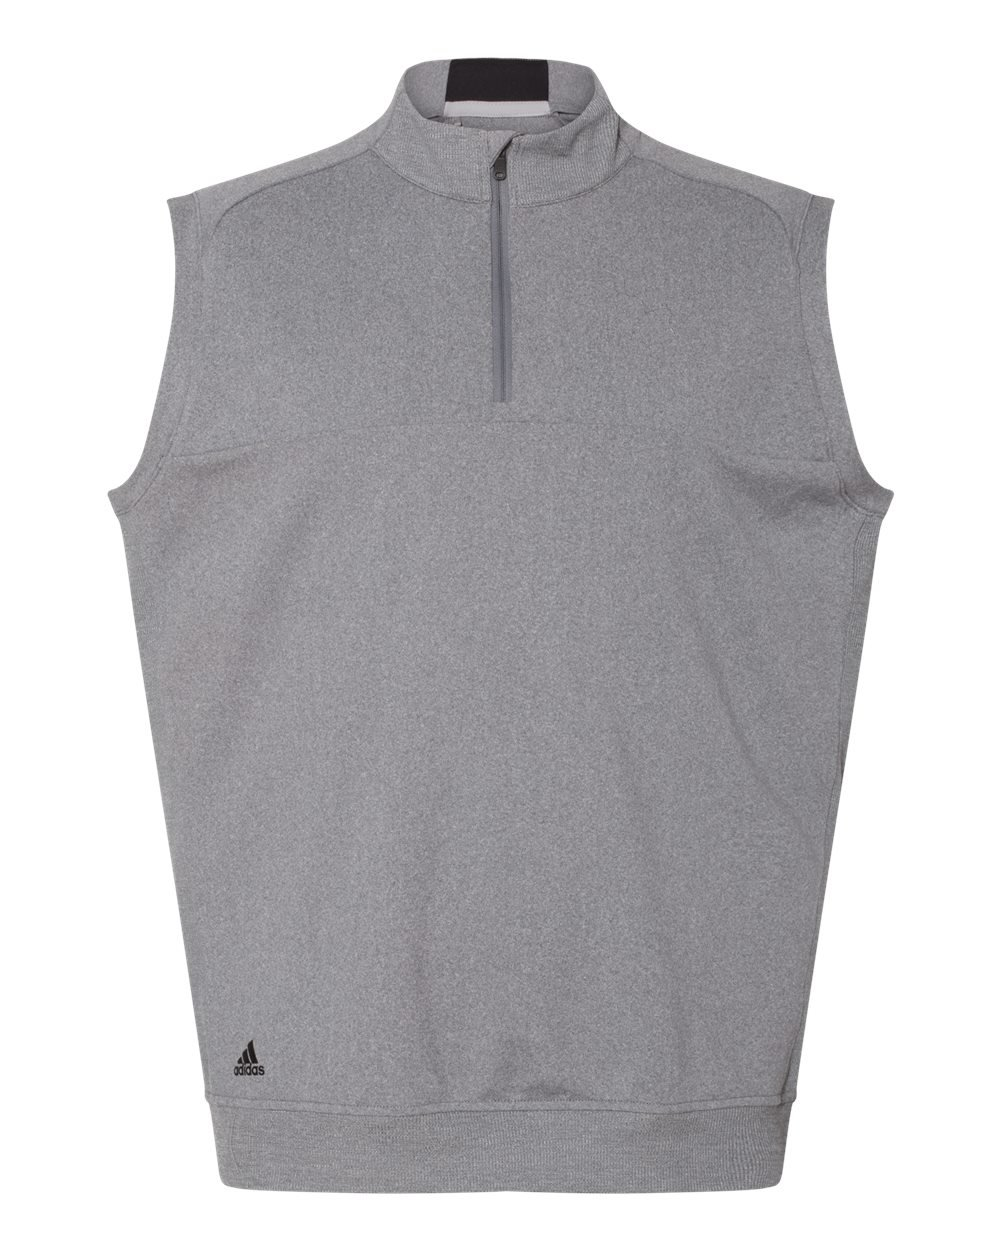 adidas Golf Mens Quarter-Zip Club Vest (A271) -Vista Grey -XL by adidas